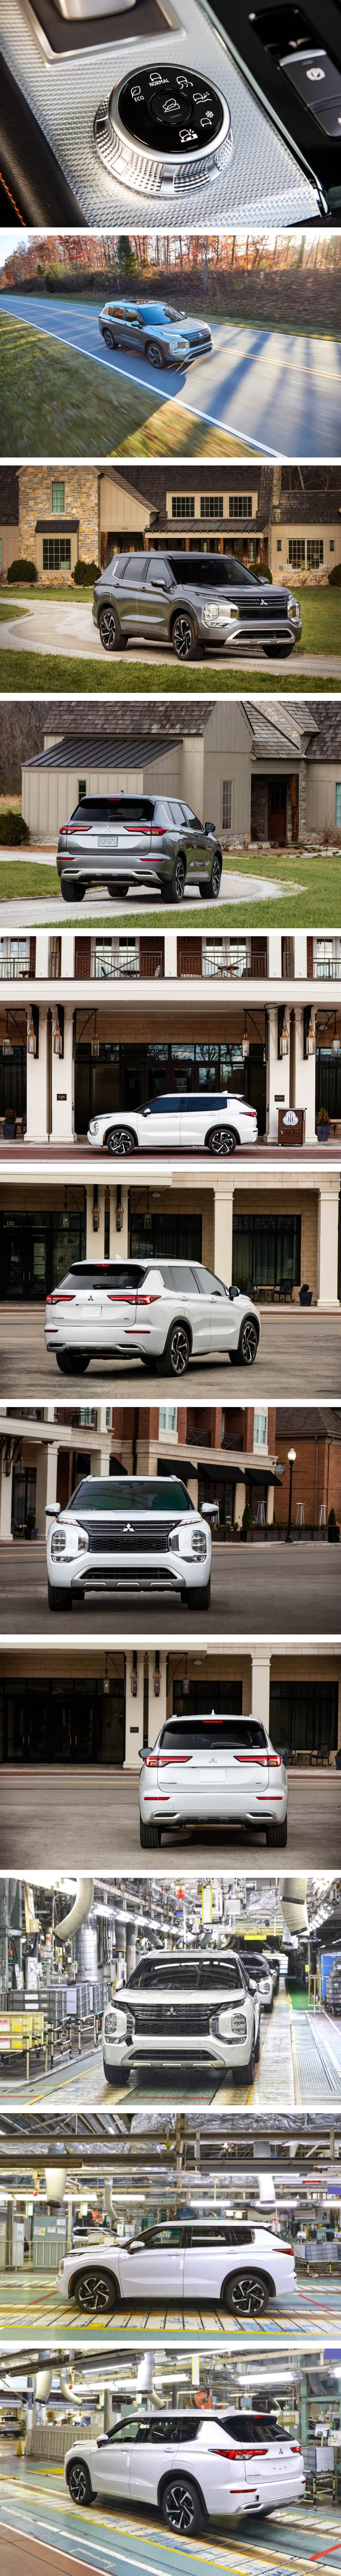 引領三菱邁入新次元,Mitsubishi 第四代 Outlander 北美首發!